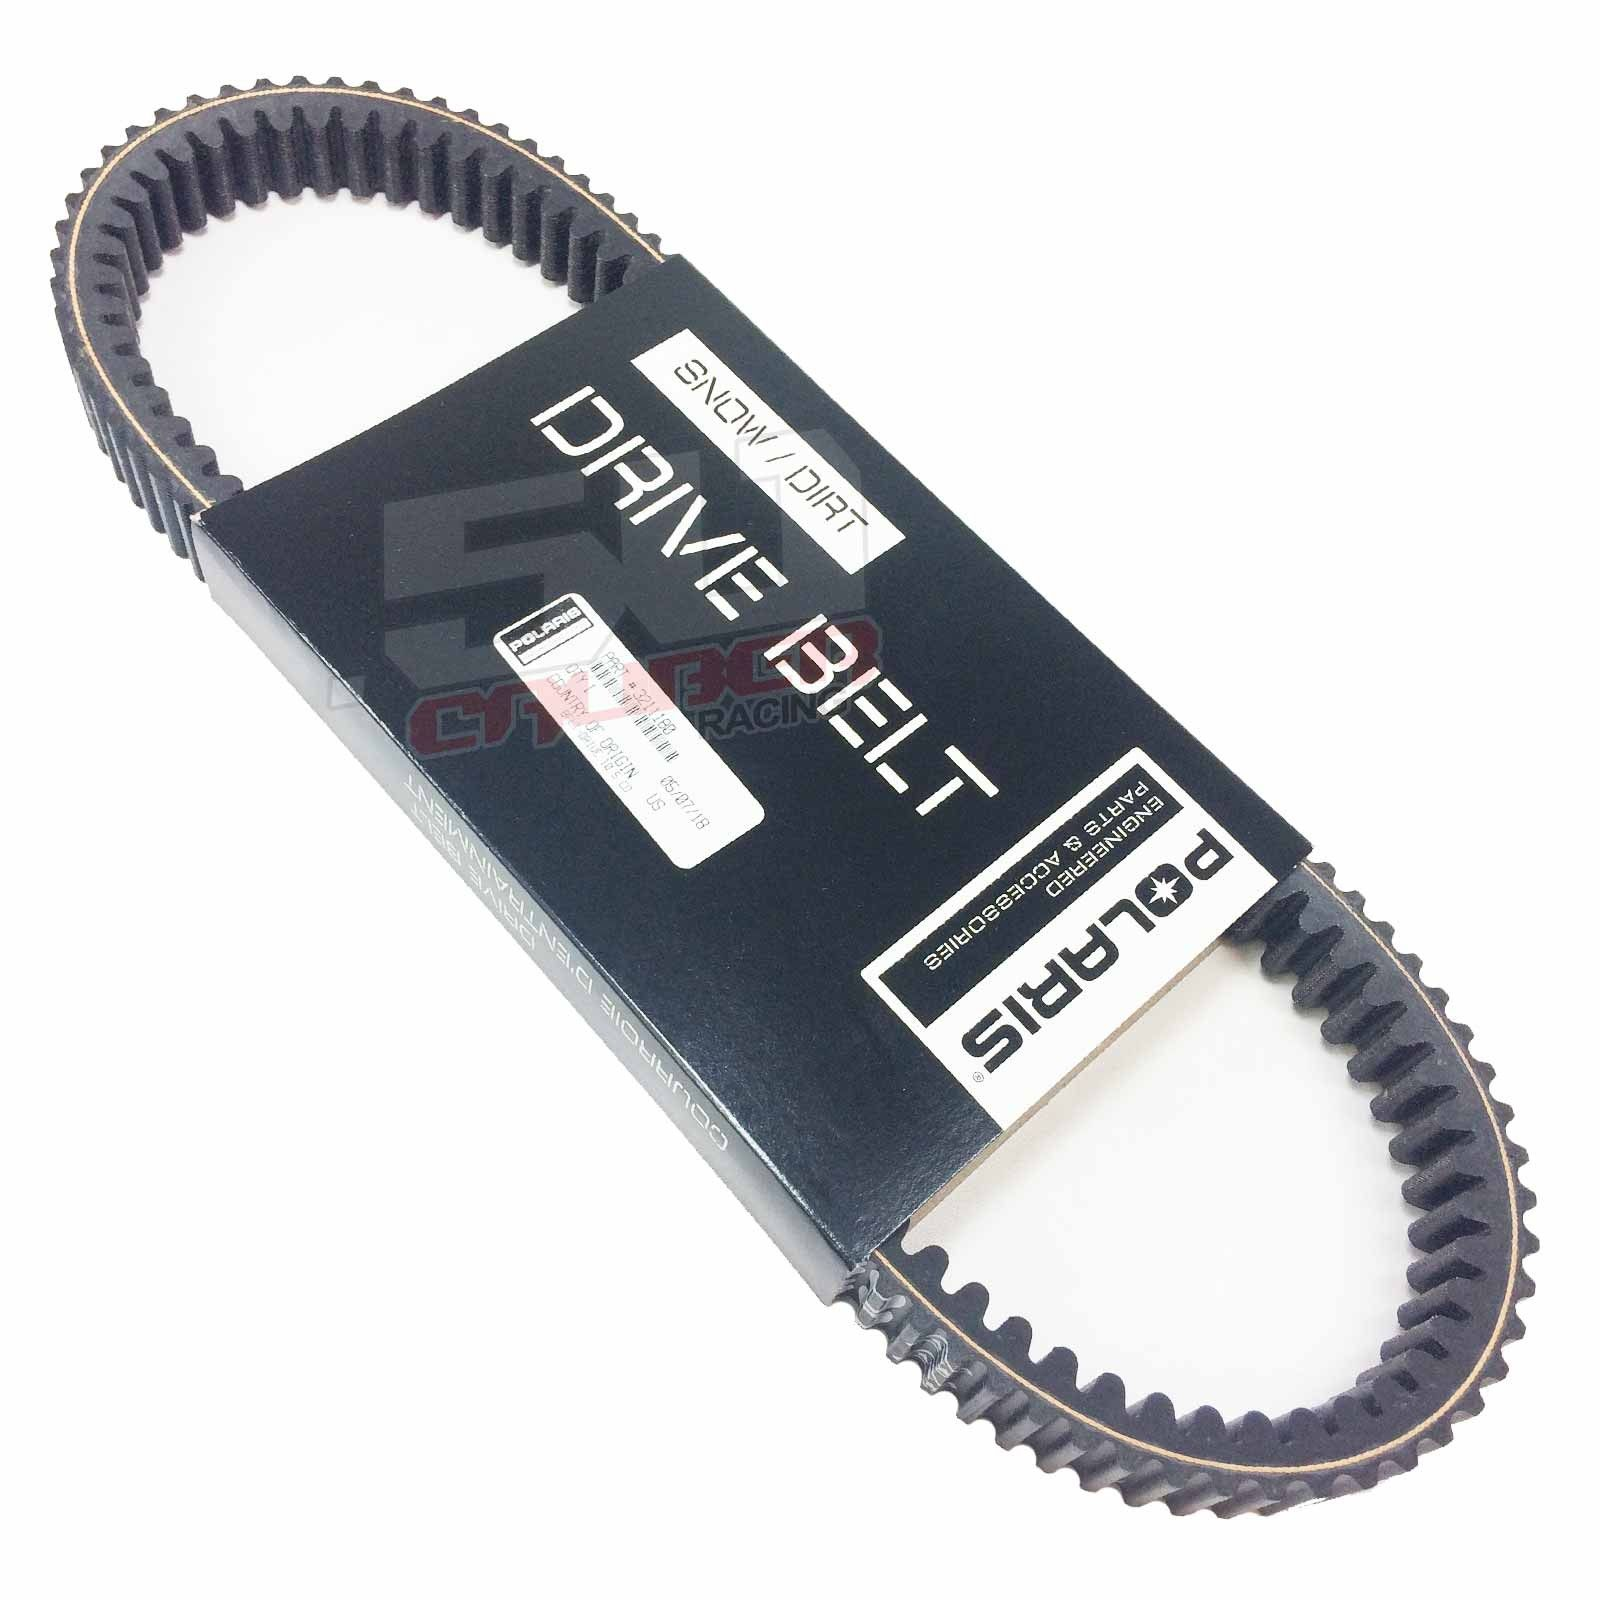 Drive Belt for Polaris RZR XP 1000 Replace 3211180 Heavy Duty